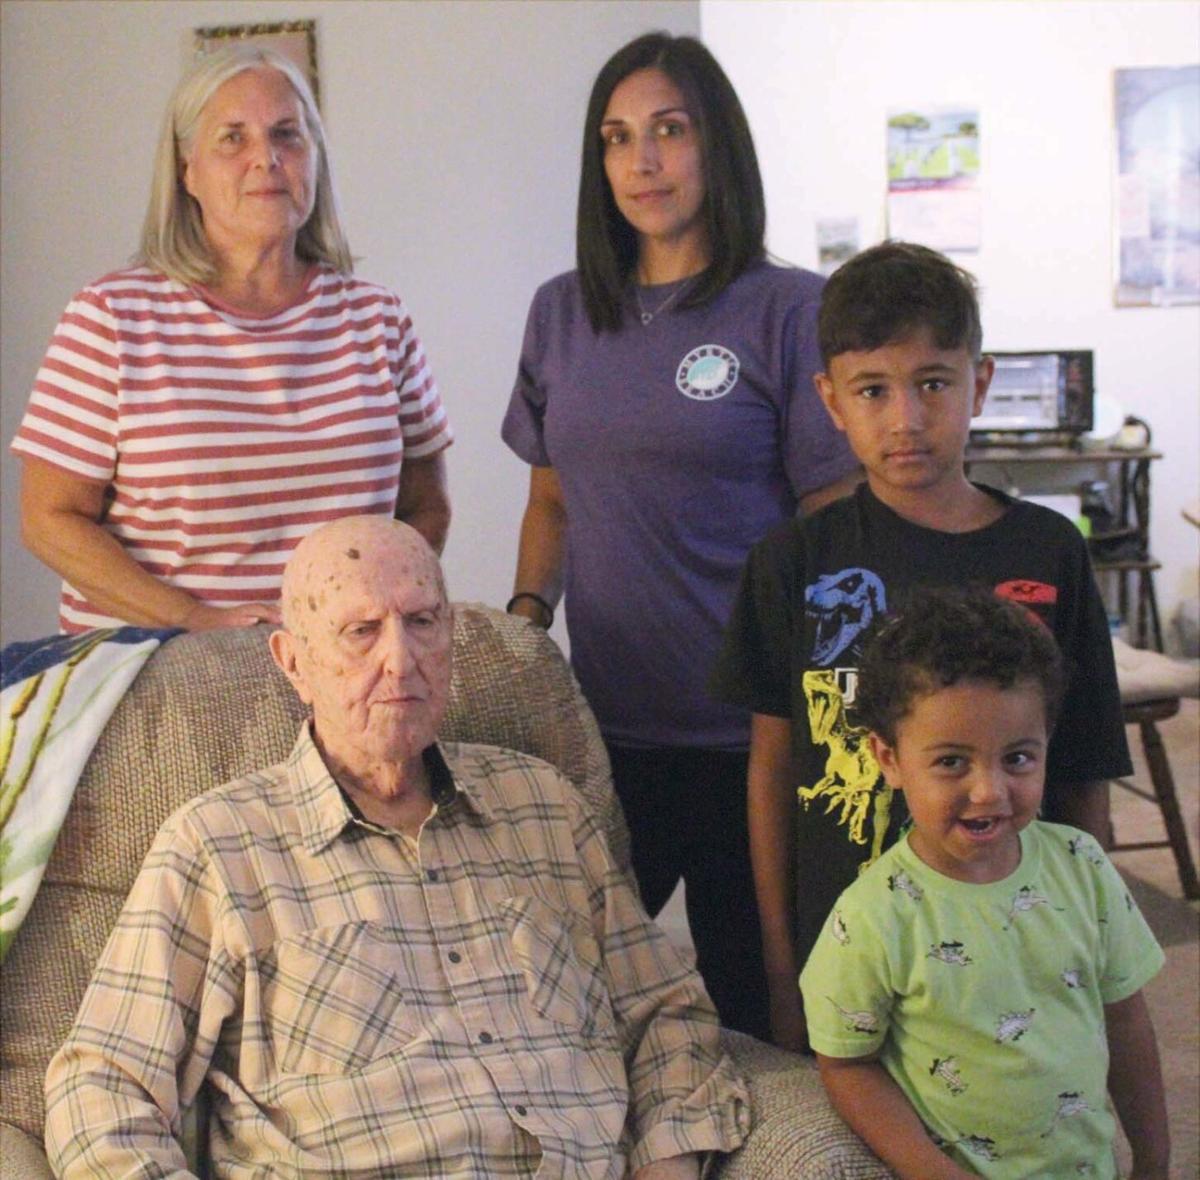 Hardin County veteran celebrates his 100th birthday